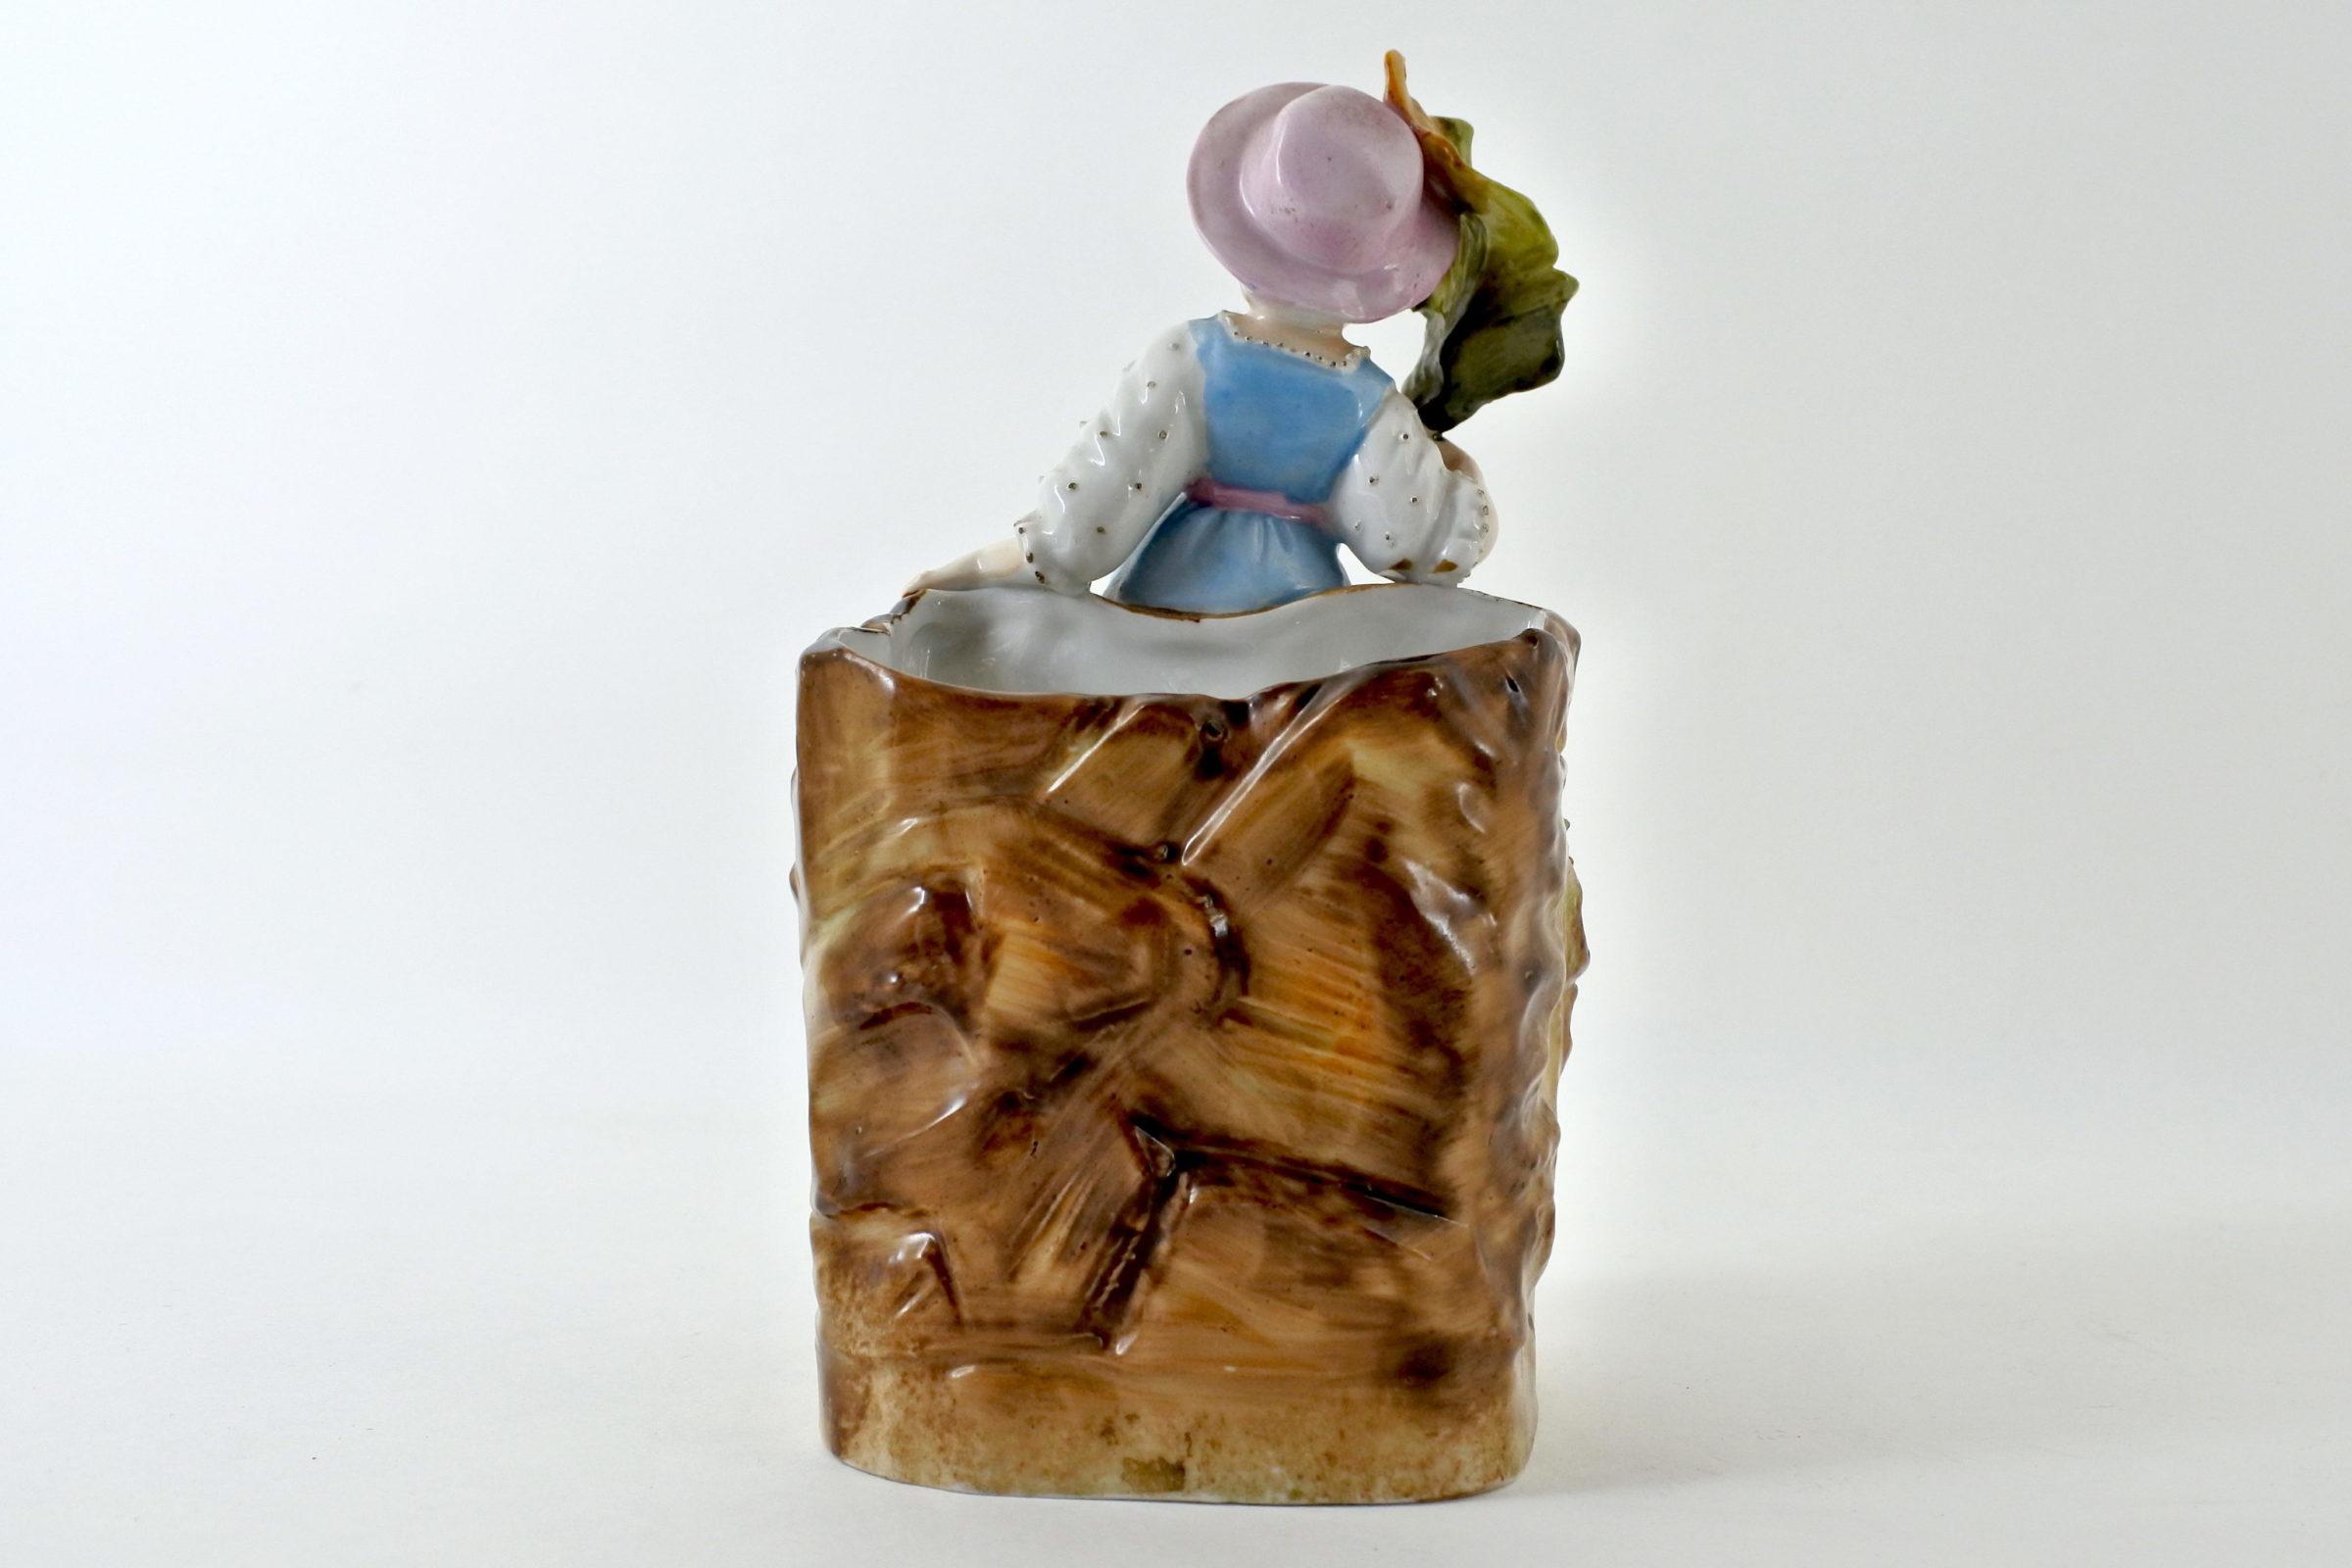 Statuina portafiori in ceramica a forma di bambina - 3